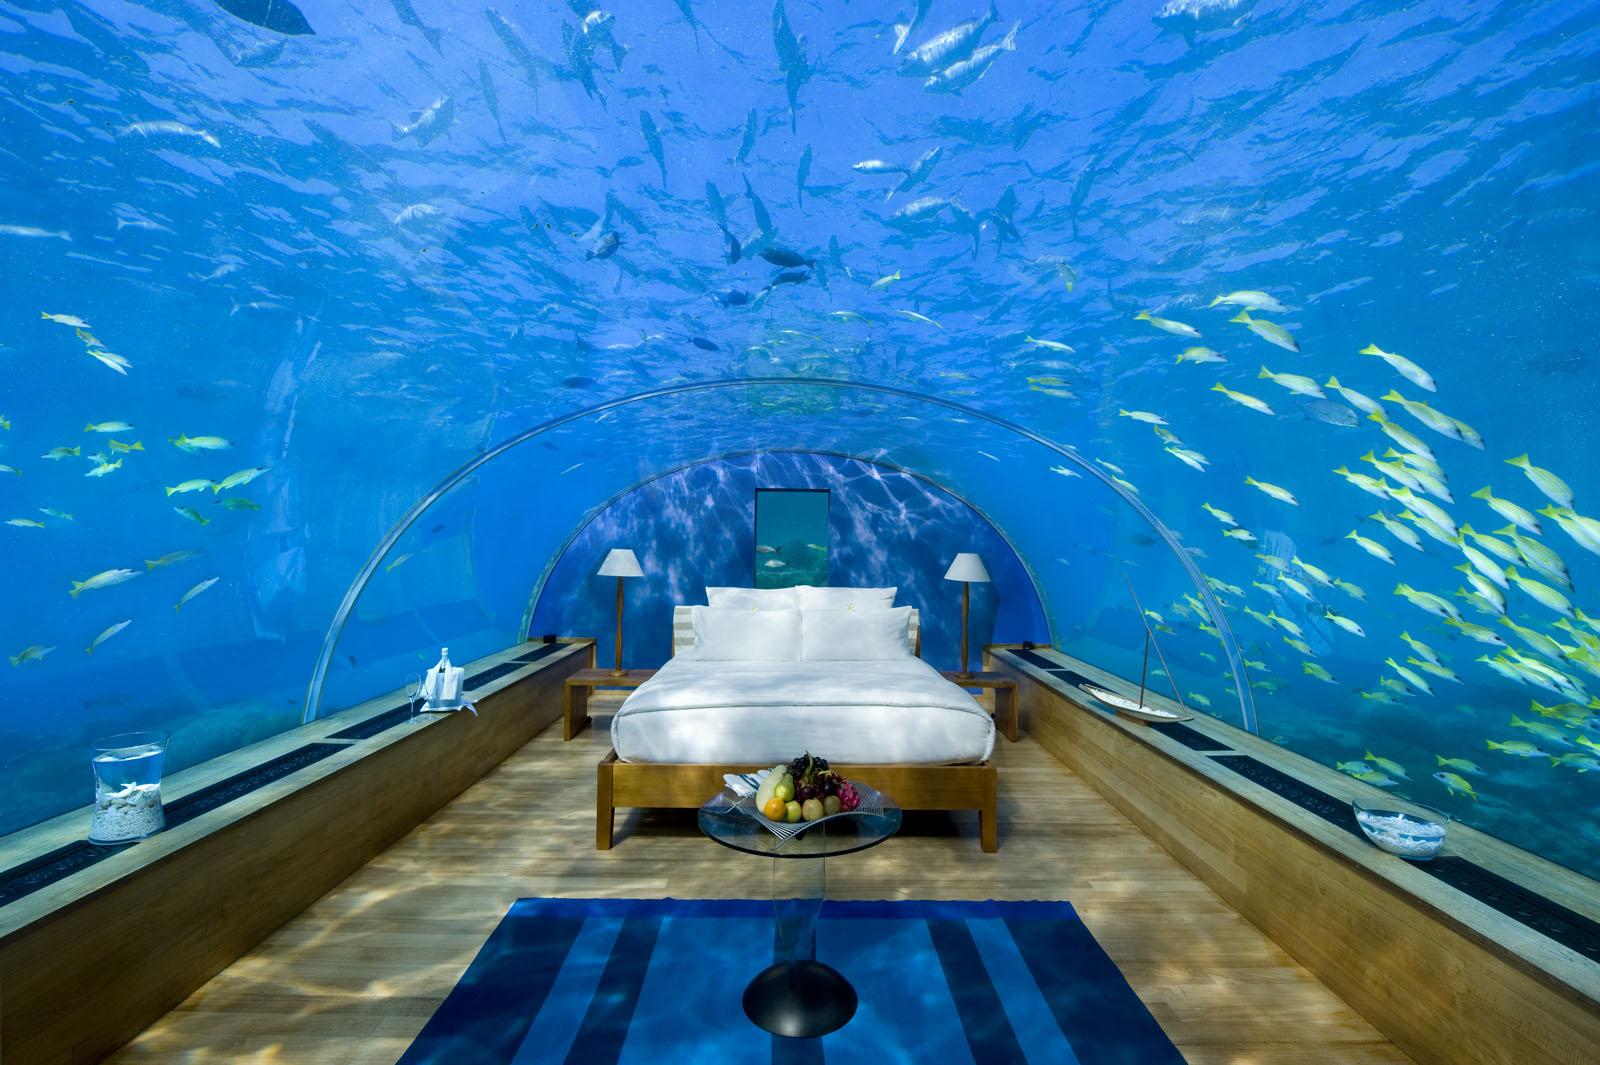 Conrad-Maldives-Rangali-Island_1